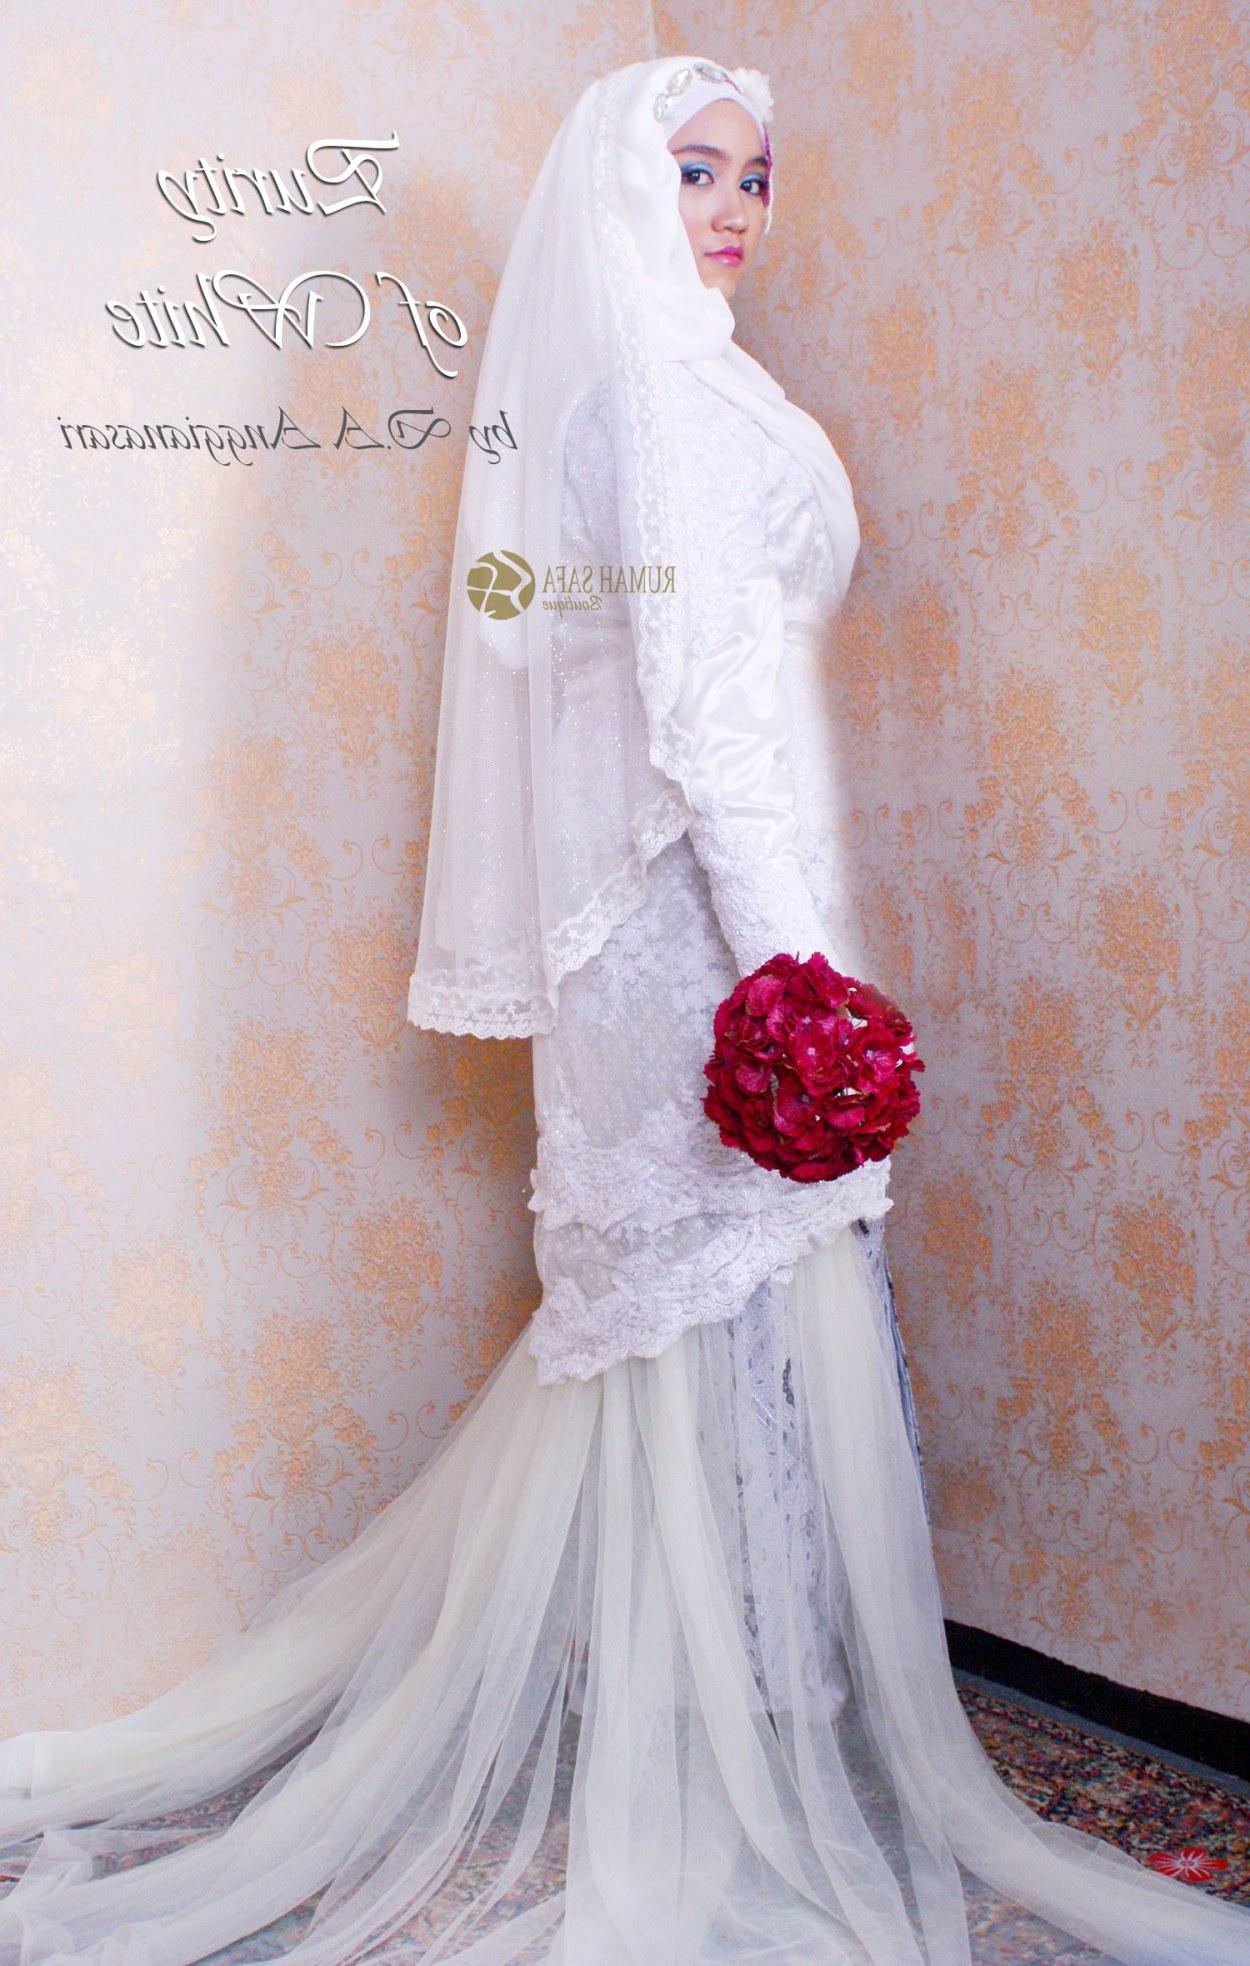 Bentuk Sewa Baju Pengantin Muslimah Thdr Gaun Pengantin Muslimah